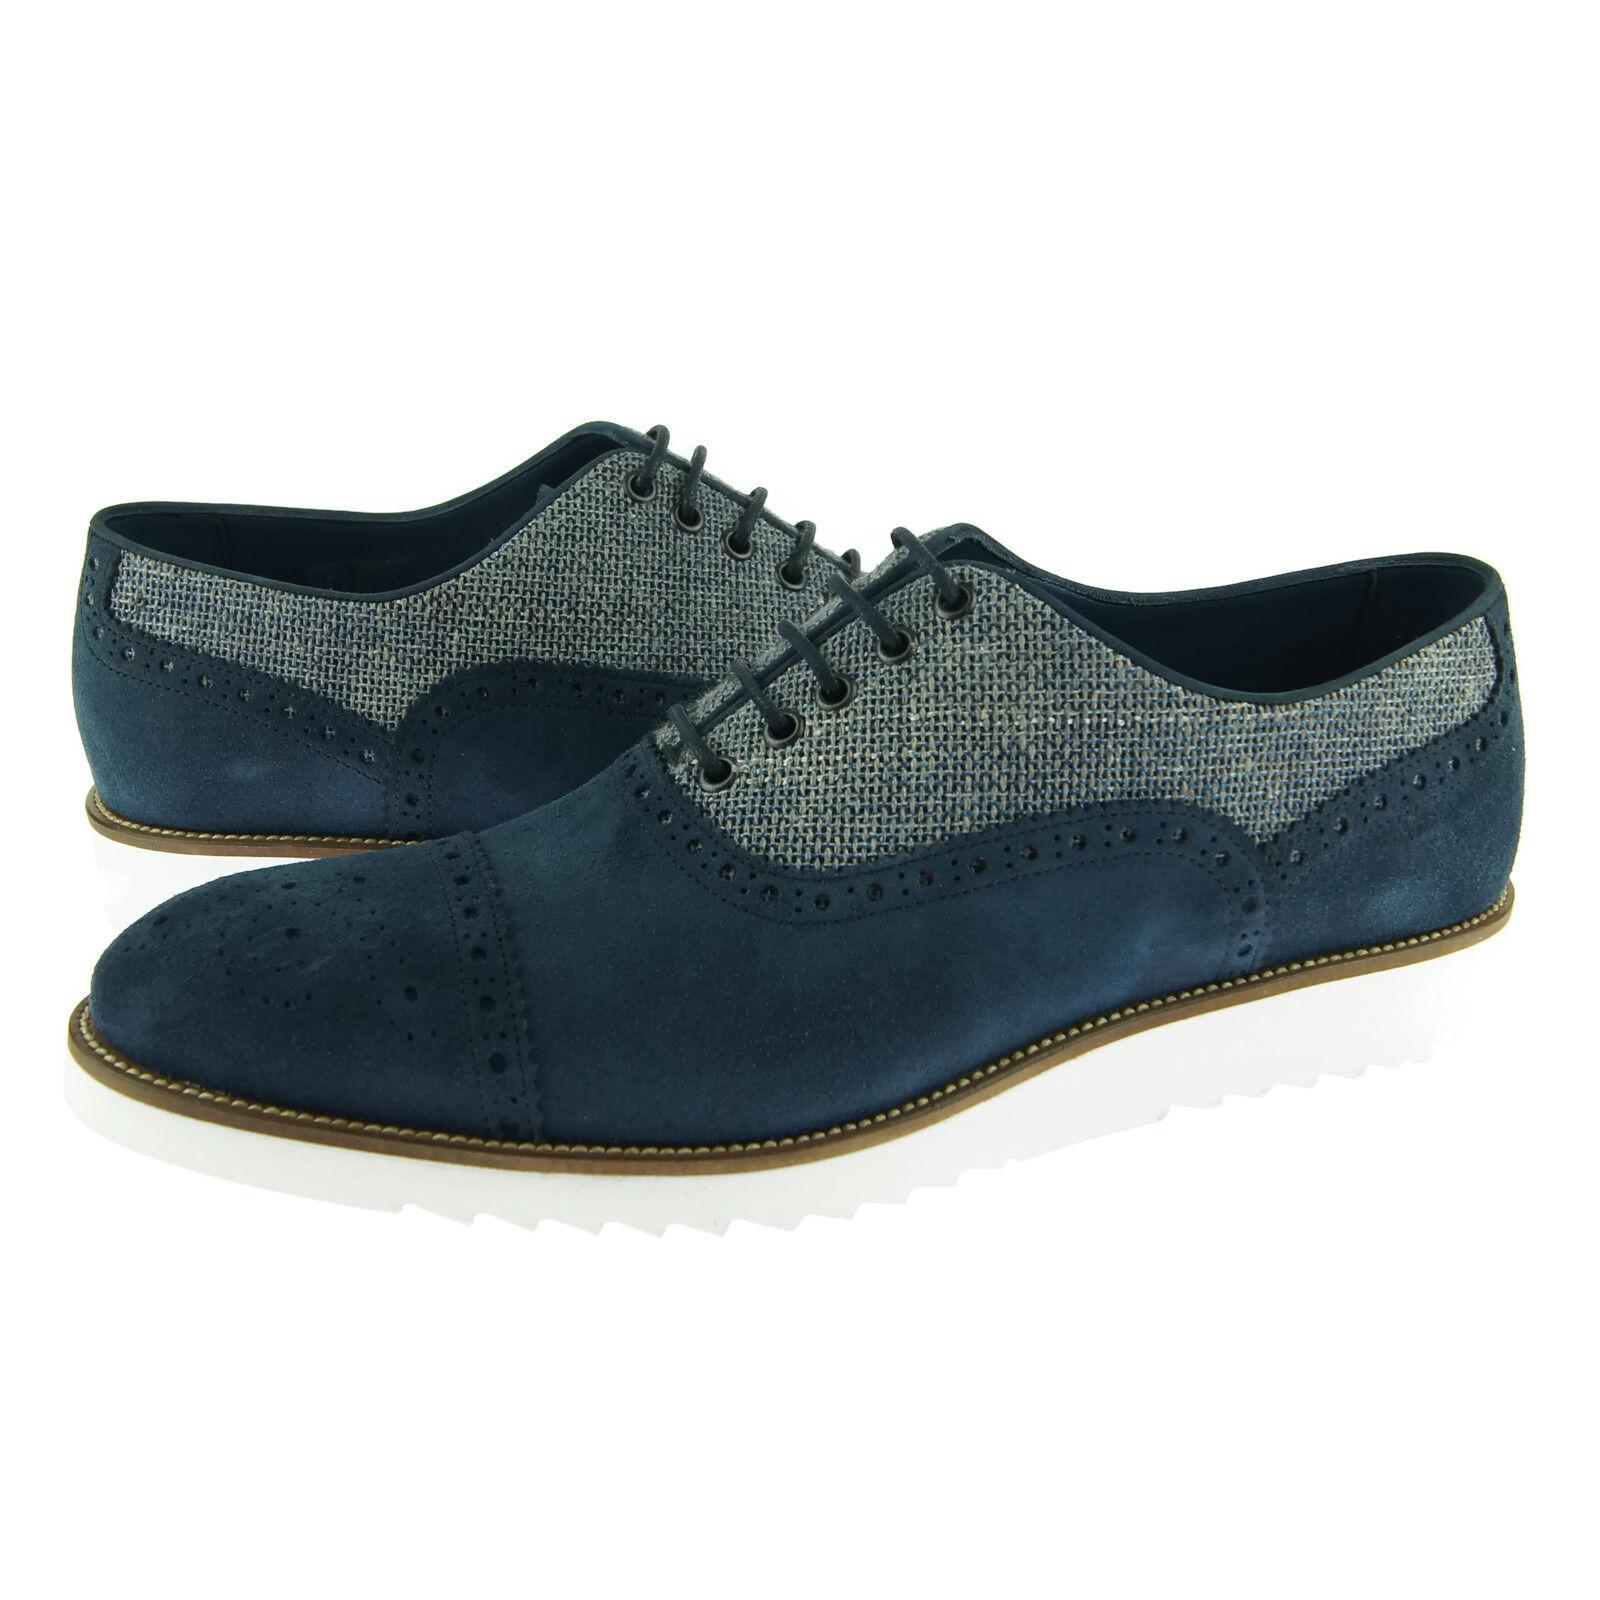 Alex D  Hampton  Brogue Oxford, Men's Dress Casual shoes, bluee Suede